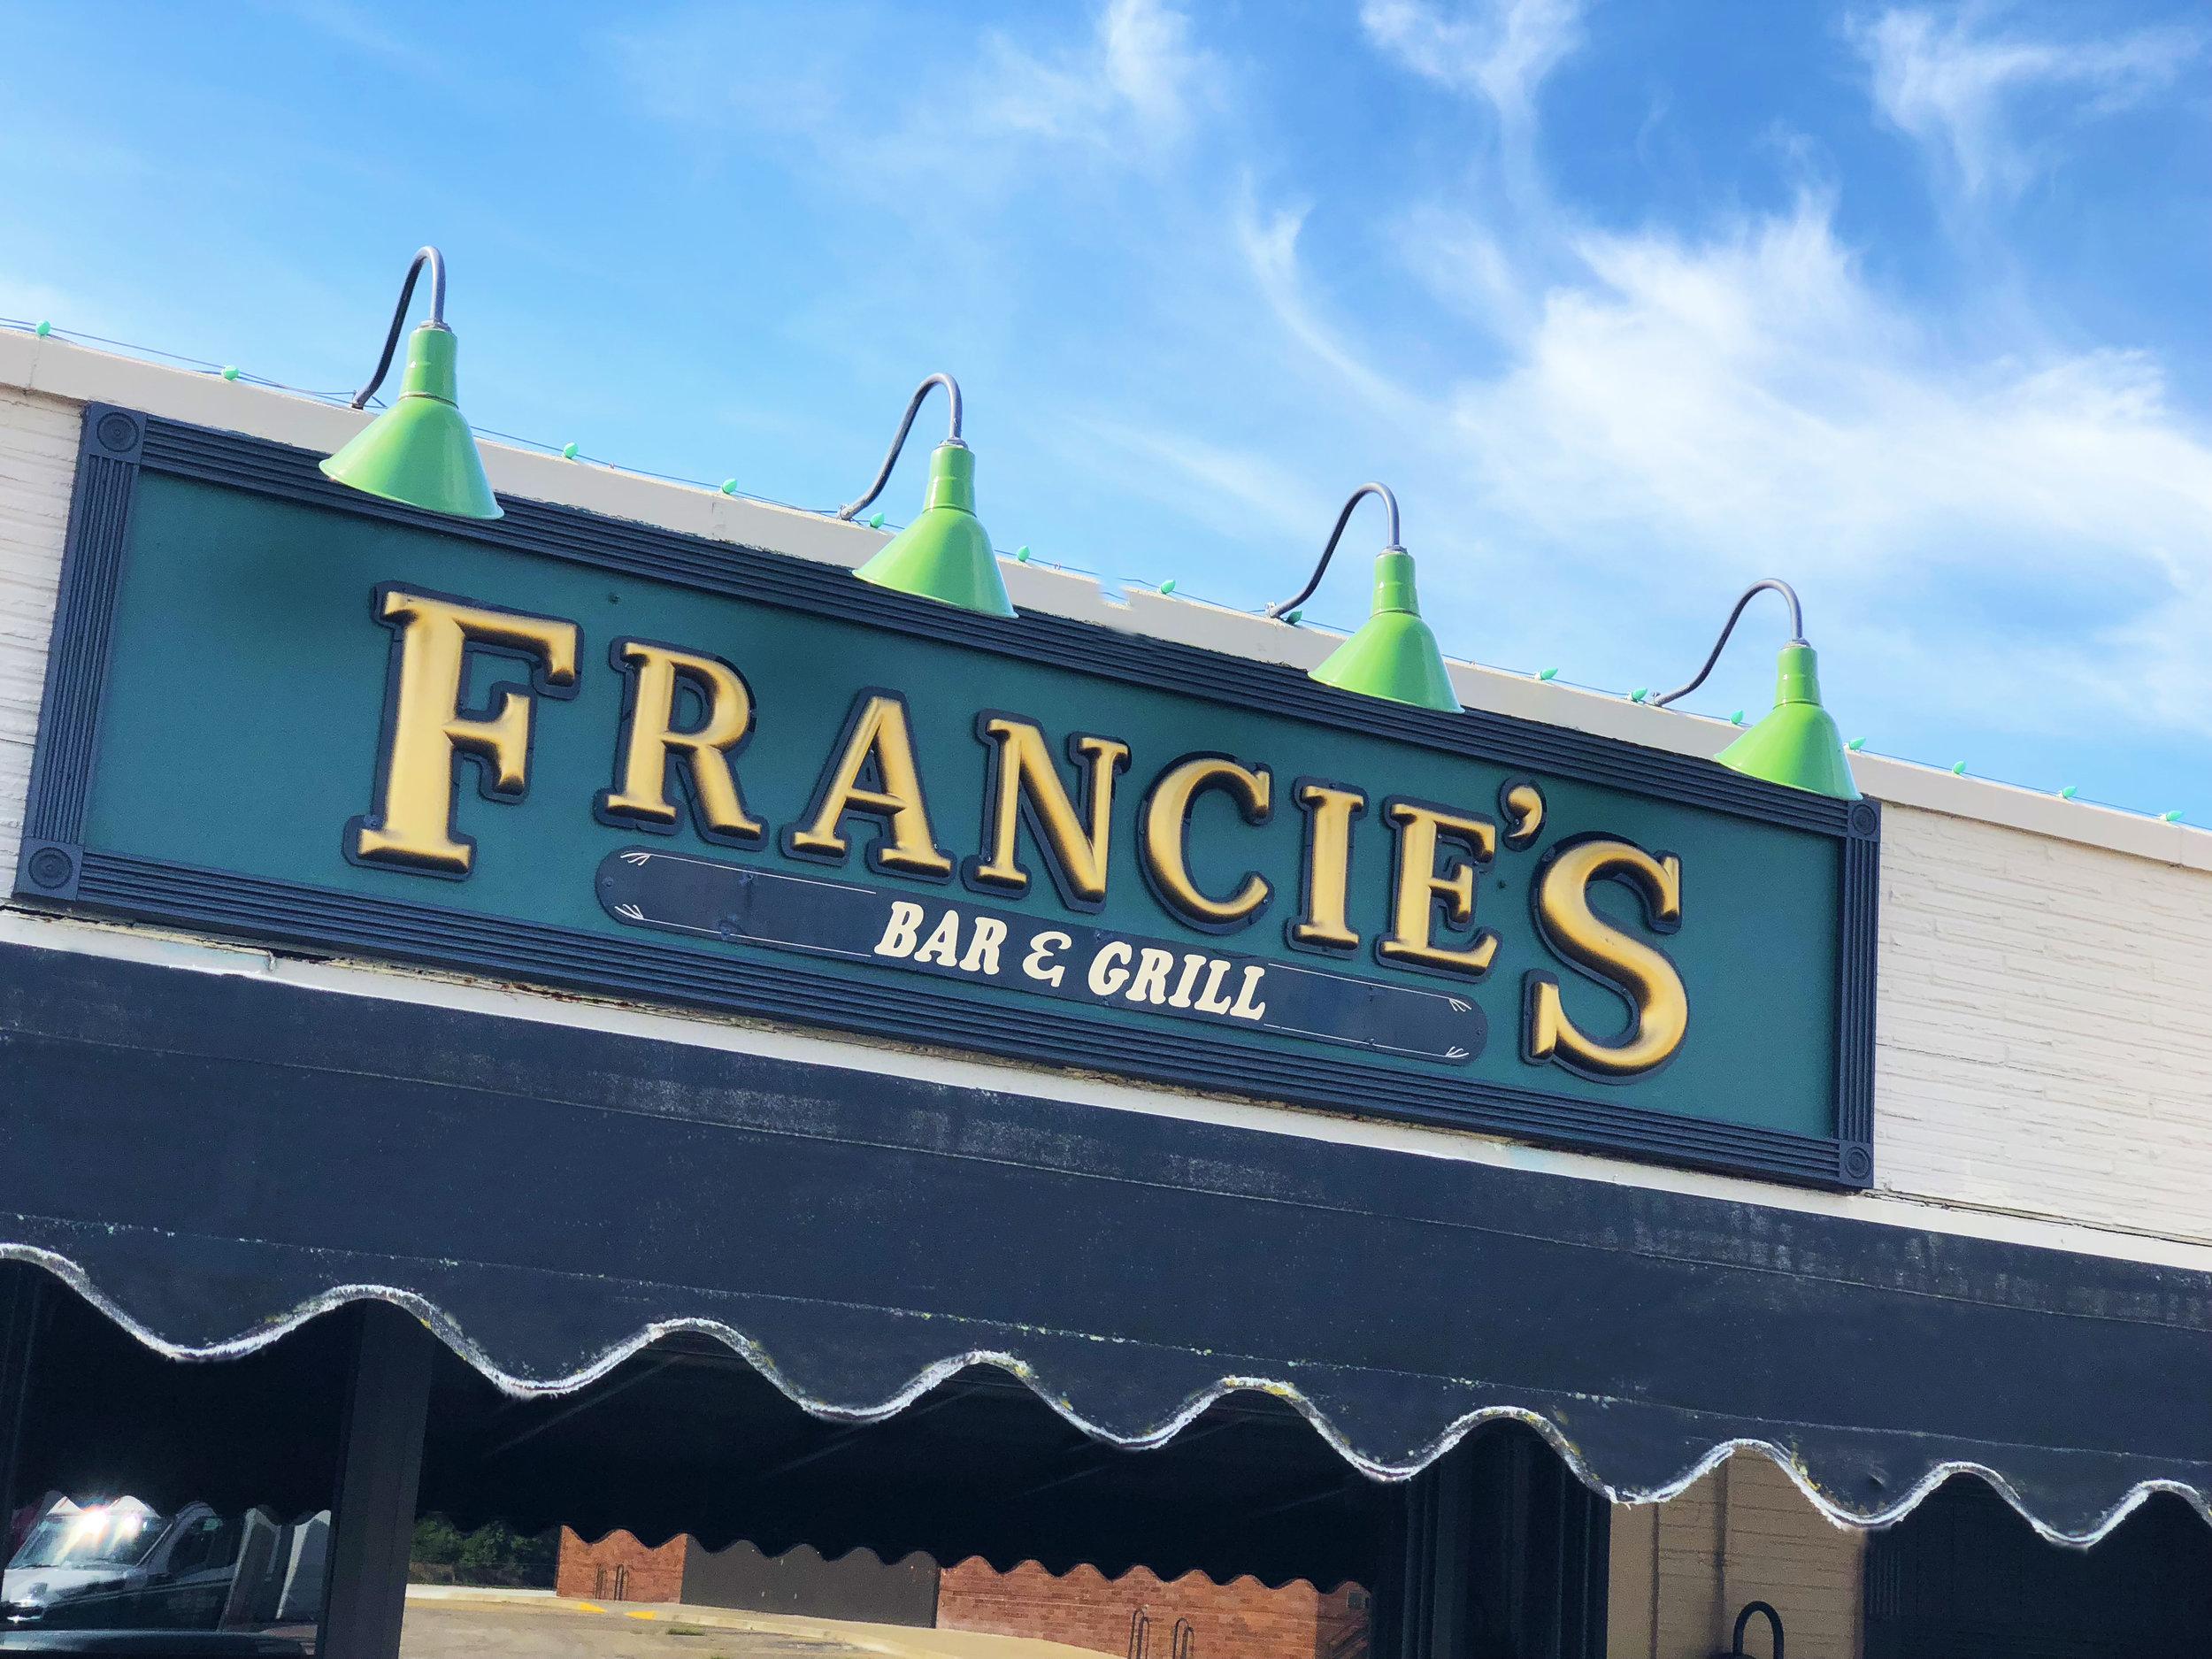 Francie's Bar & Grill || Des Moines Restaurant || Local